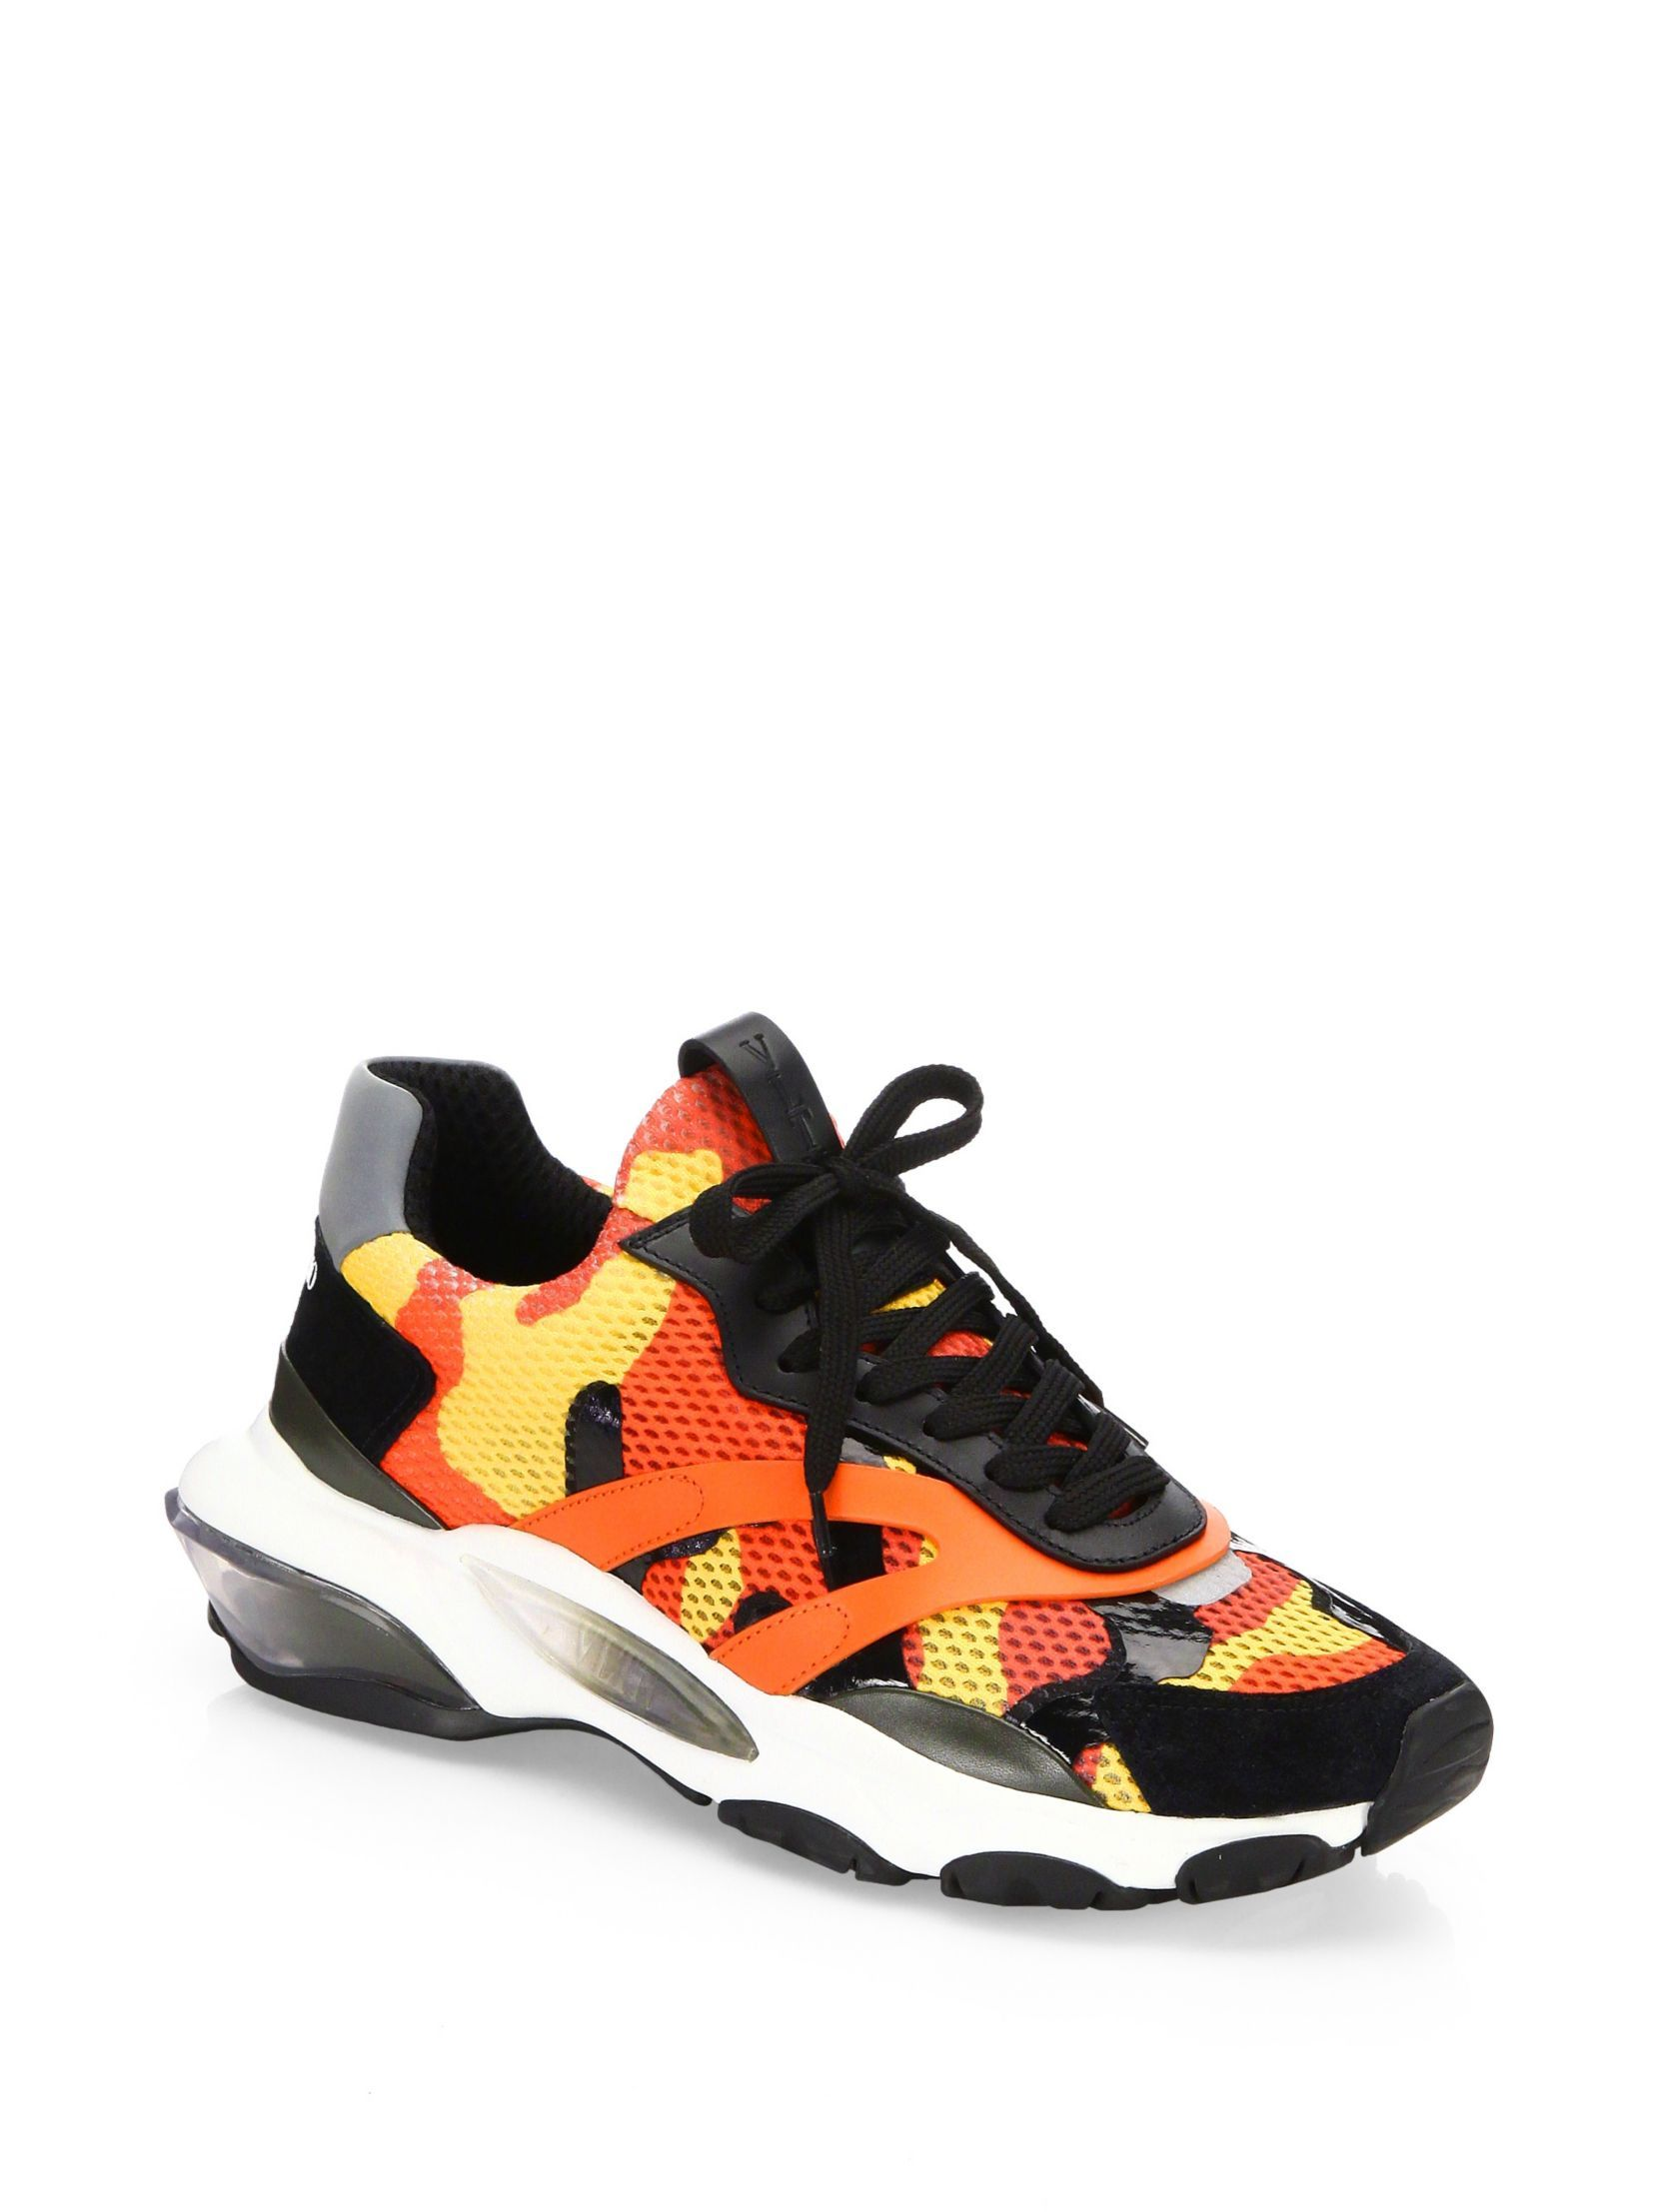 0b9d47ba66c12 Valentino Garavani Camouflage Bounce Sneakers